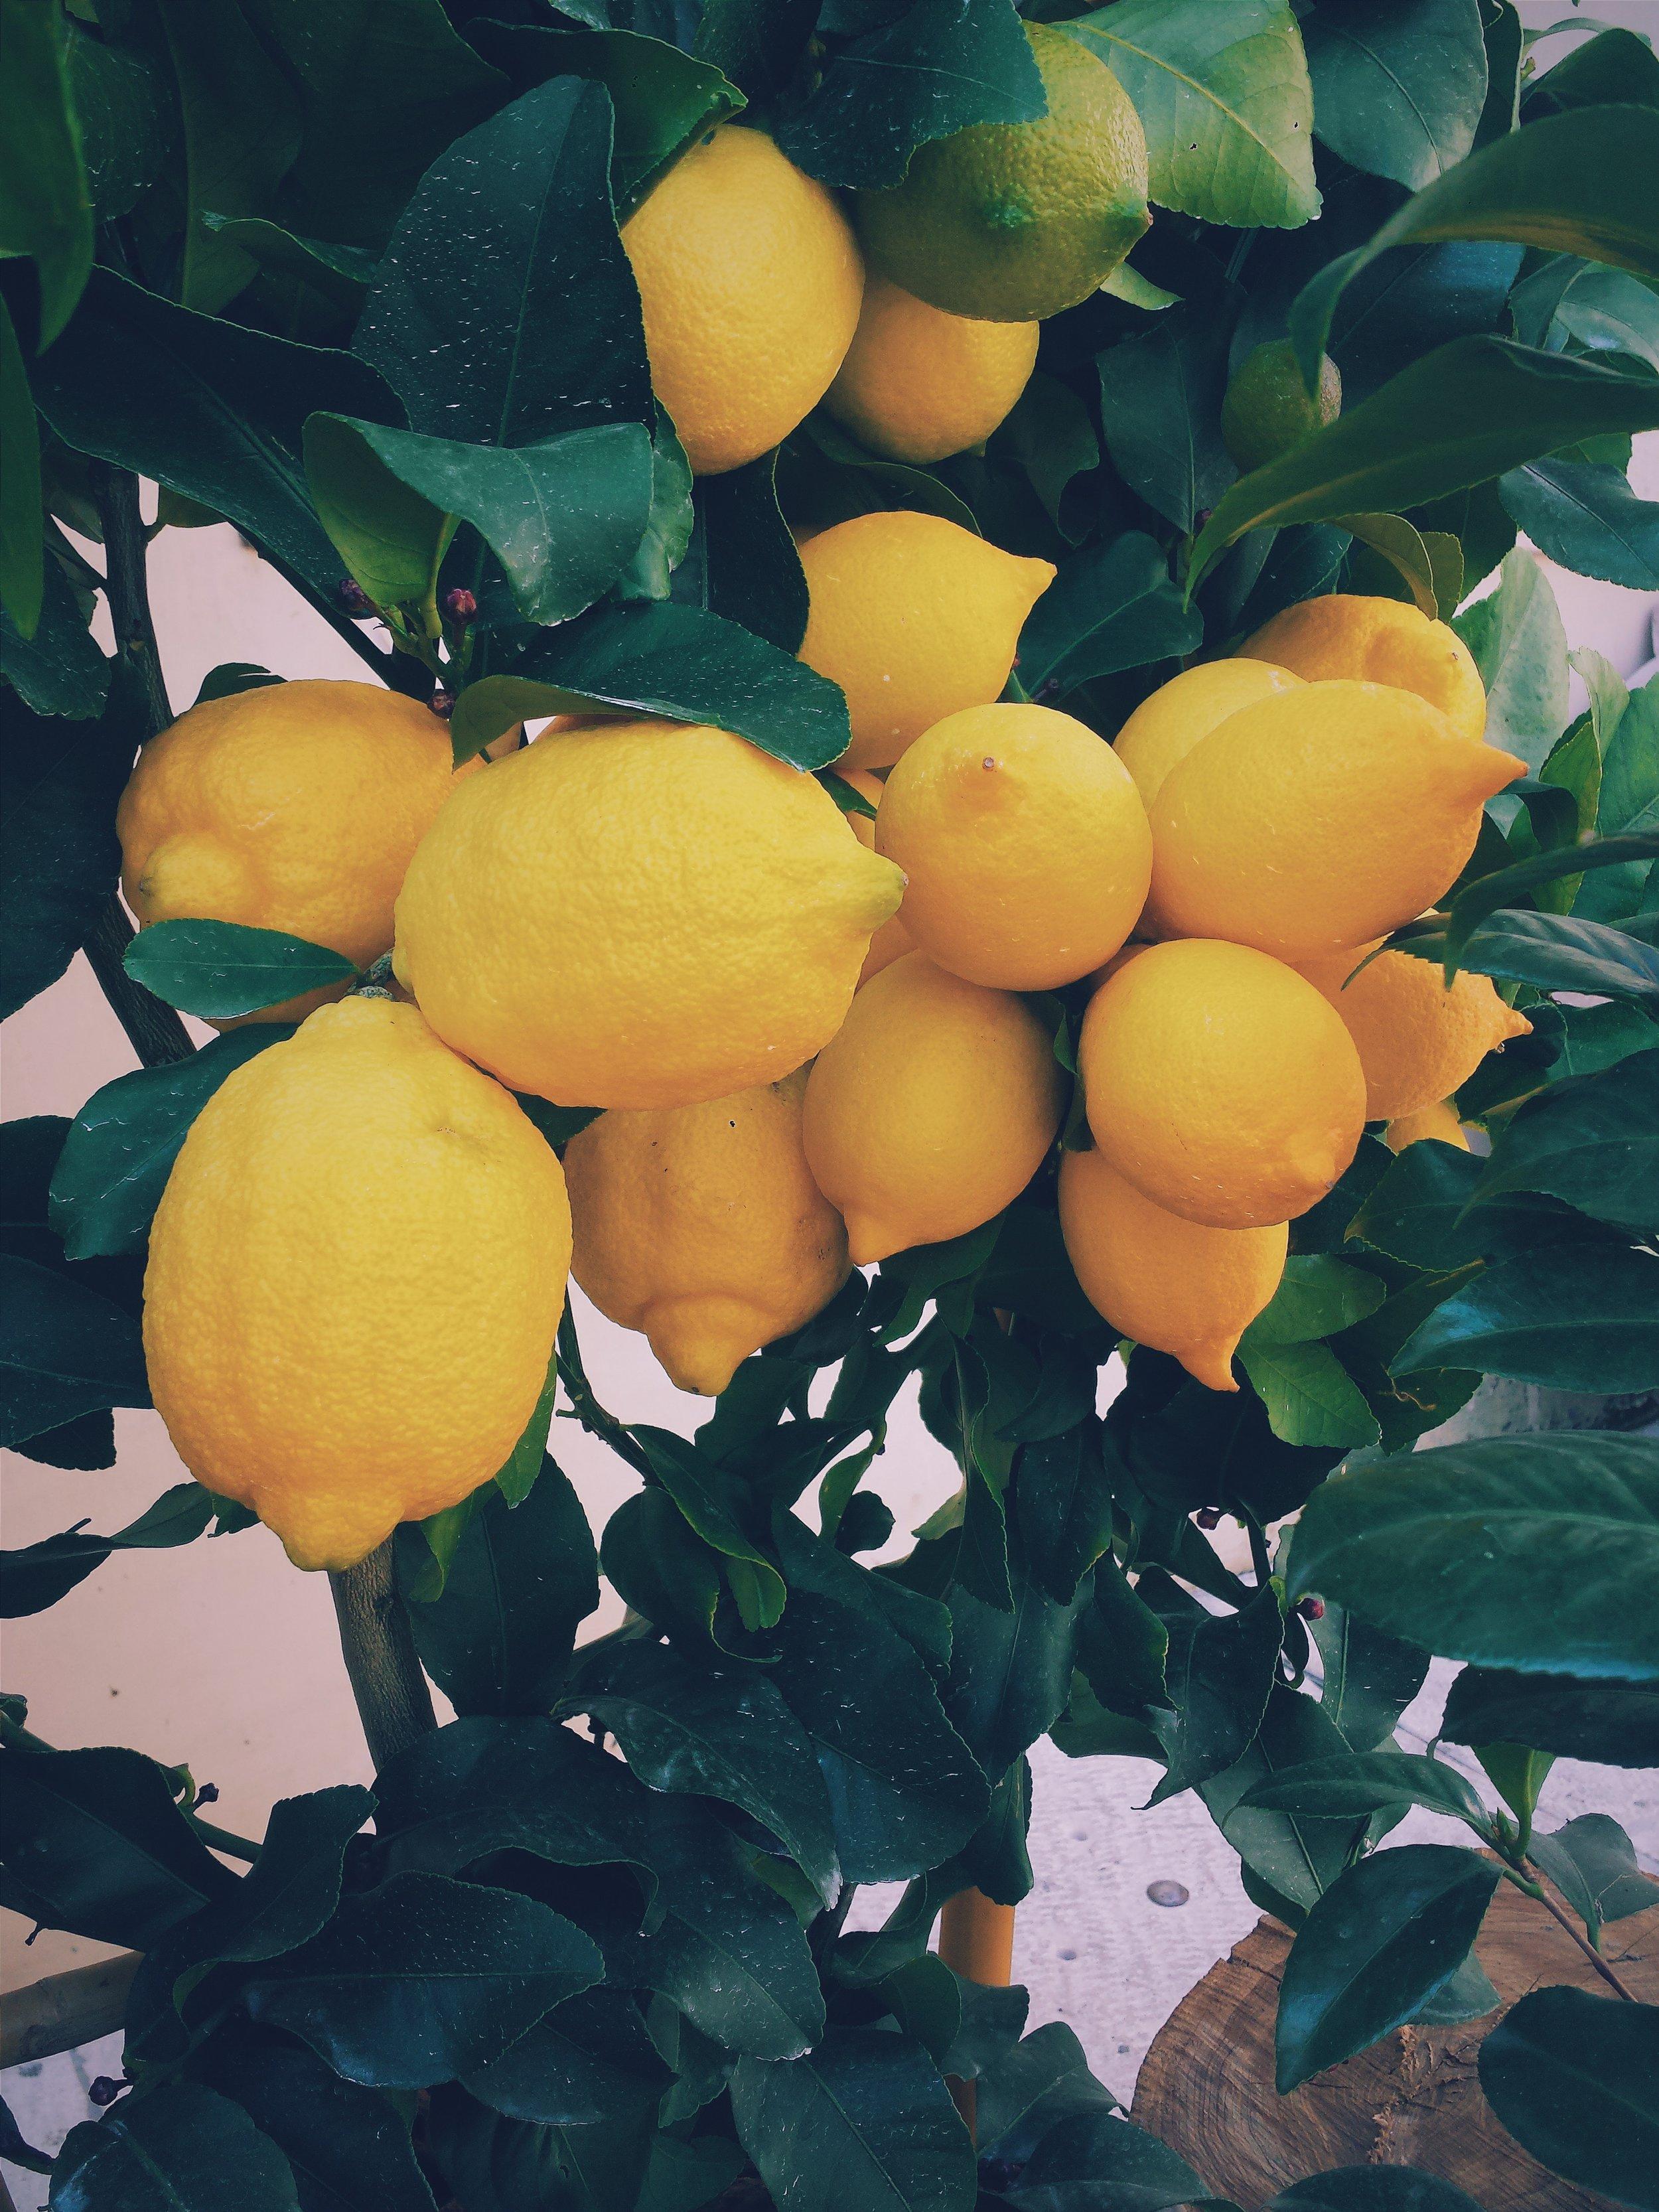 Lemon essential oil is produced by cold pressing lemon peel